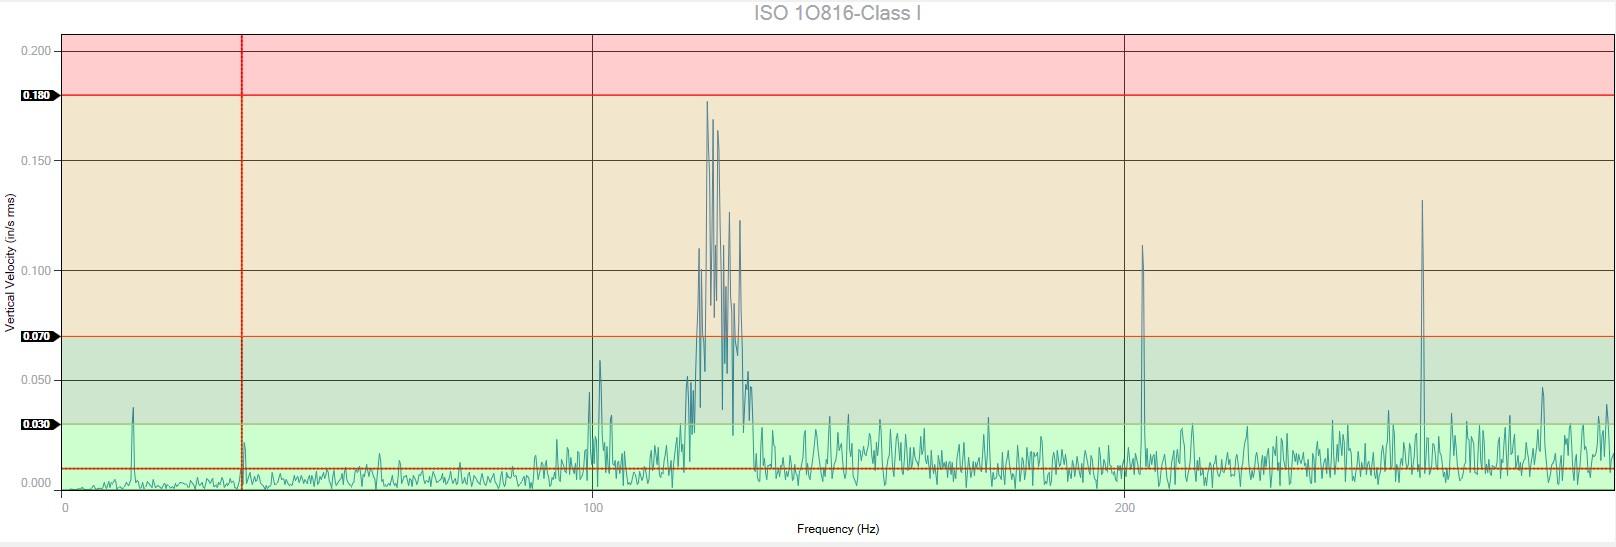 VibVue ISO Chart Background